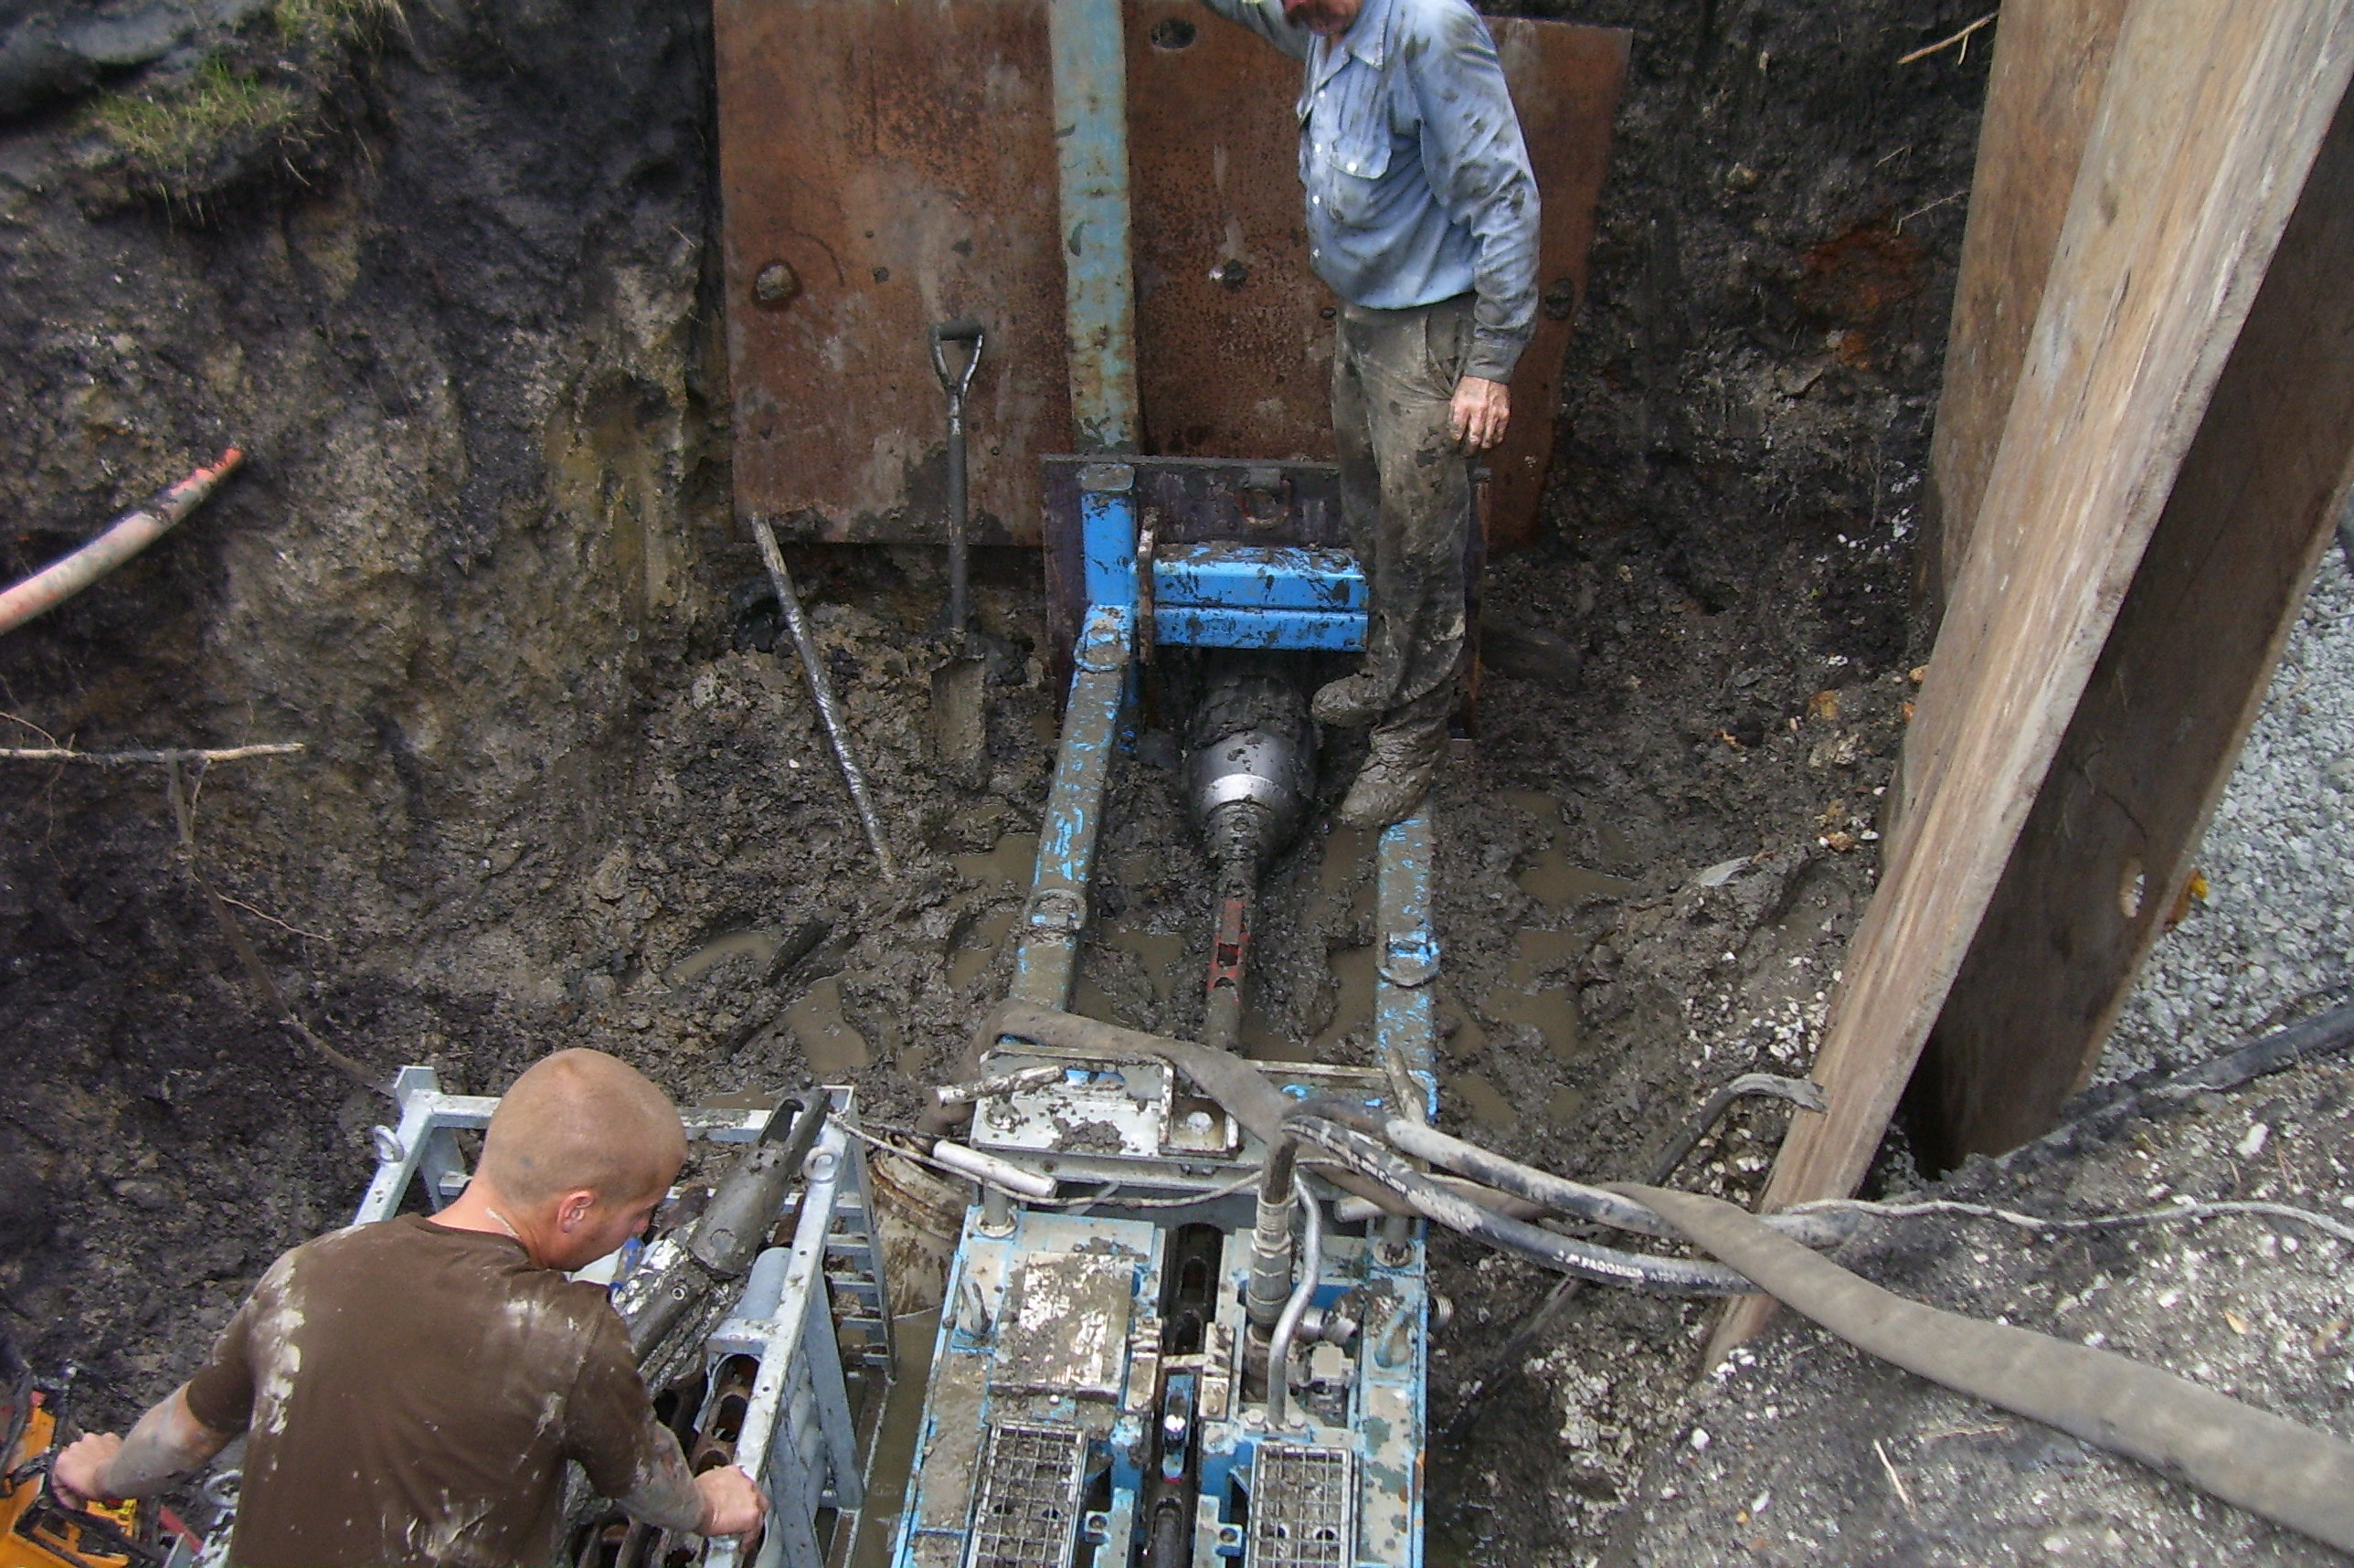 Water Main Improvements – Pipe Bursting